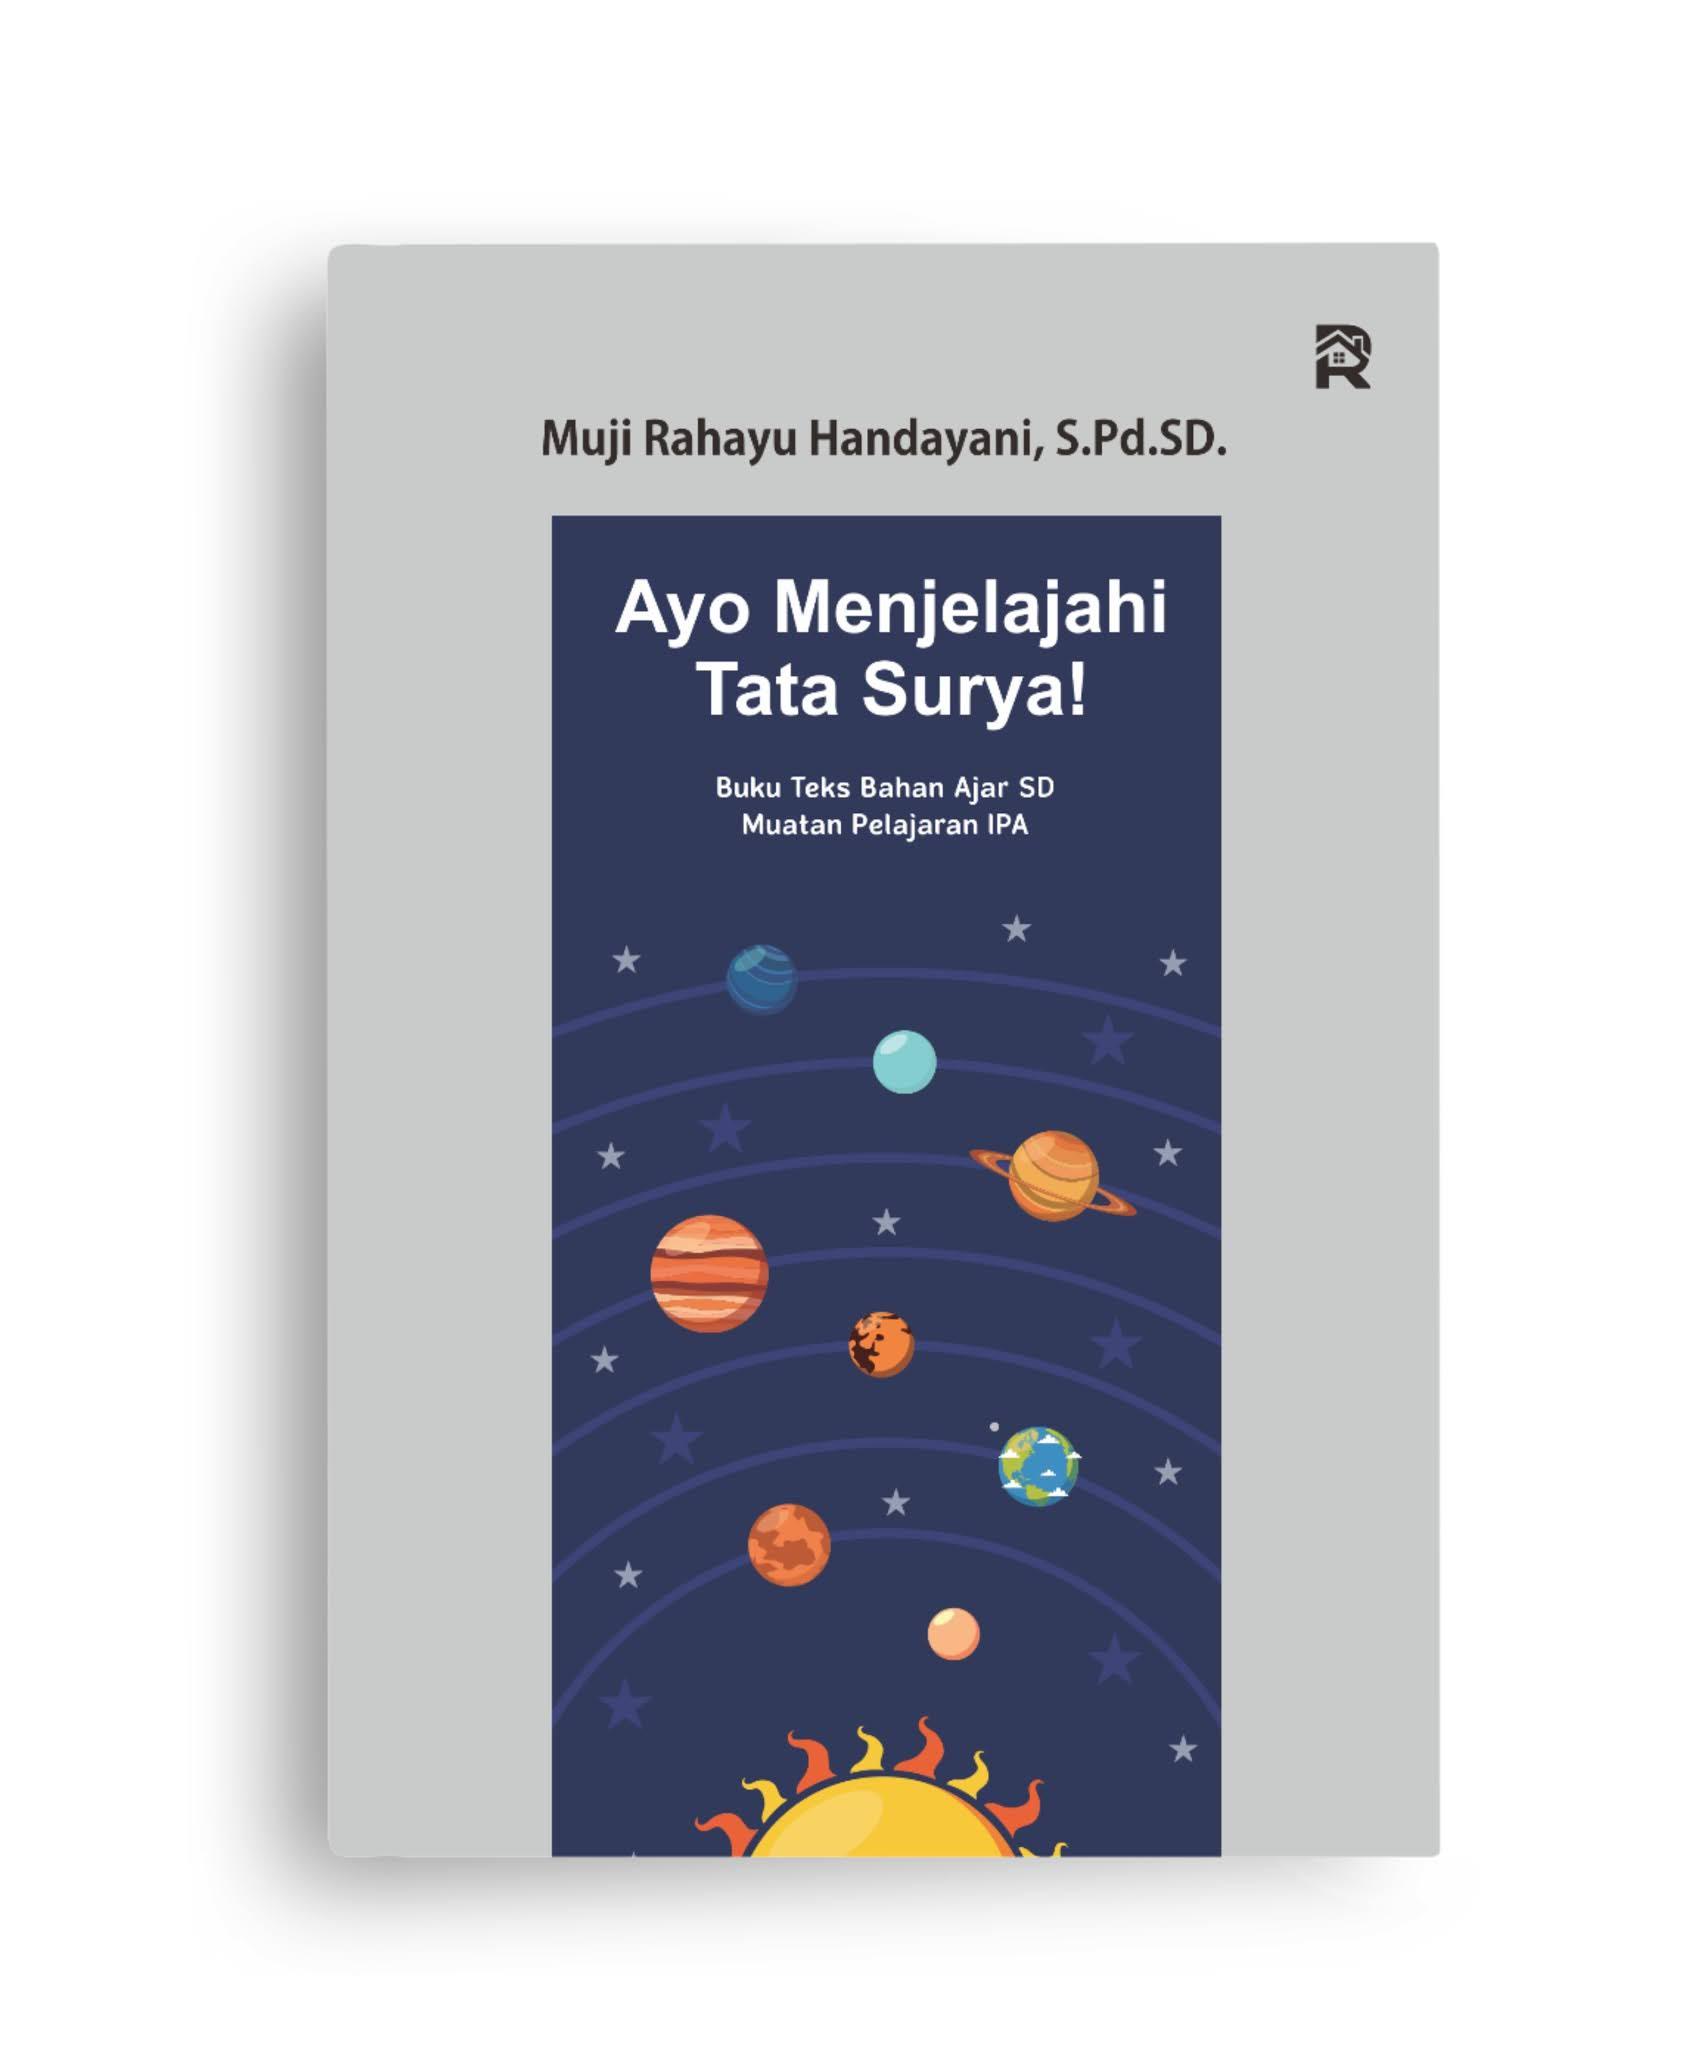 Ayo Menjelajahi Tata Surya (Buku Teks Bahan Ajar SD Muatan Pelajaran IPA)